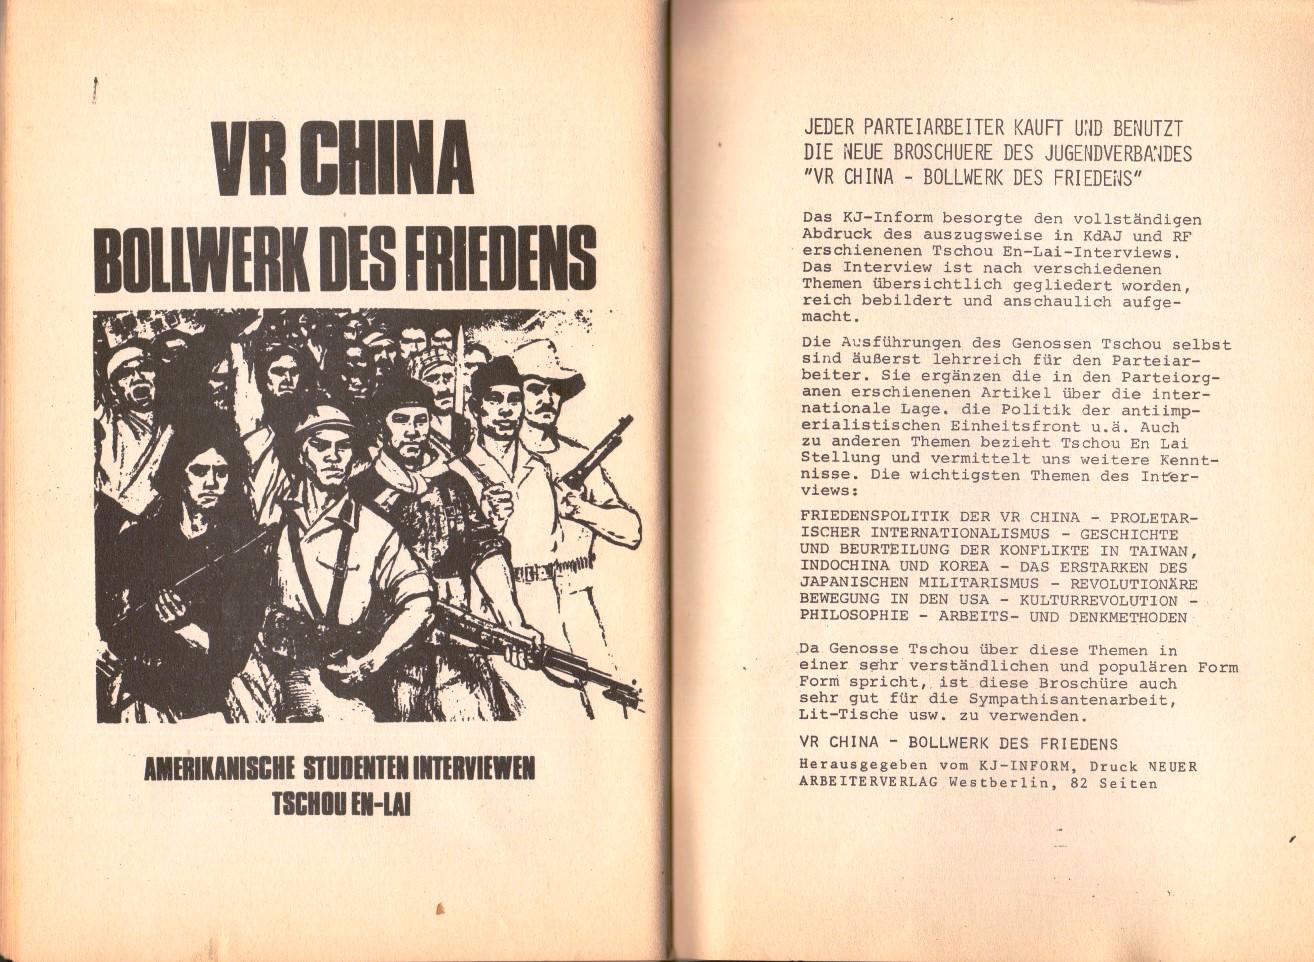 ZB_Parteiarbeiter_1971_10_37